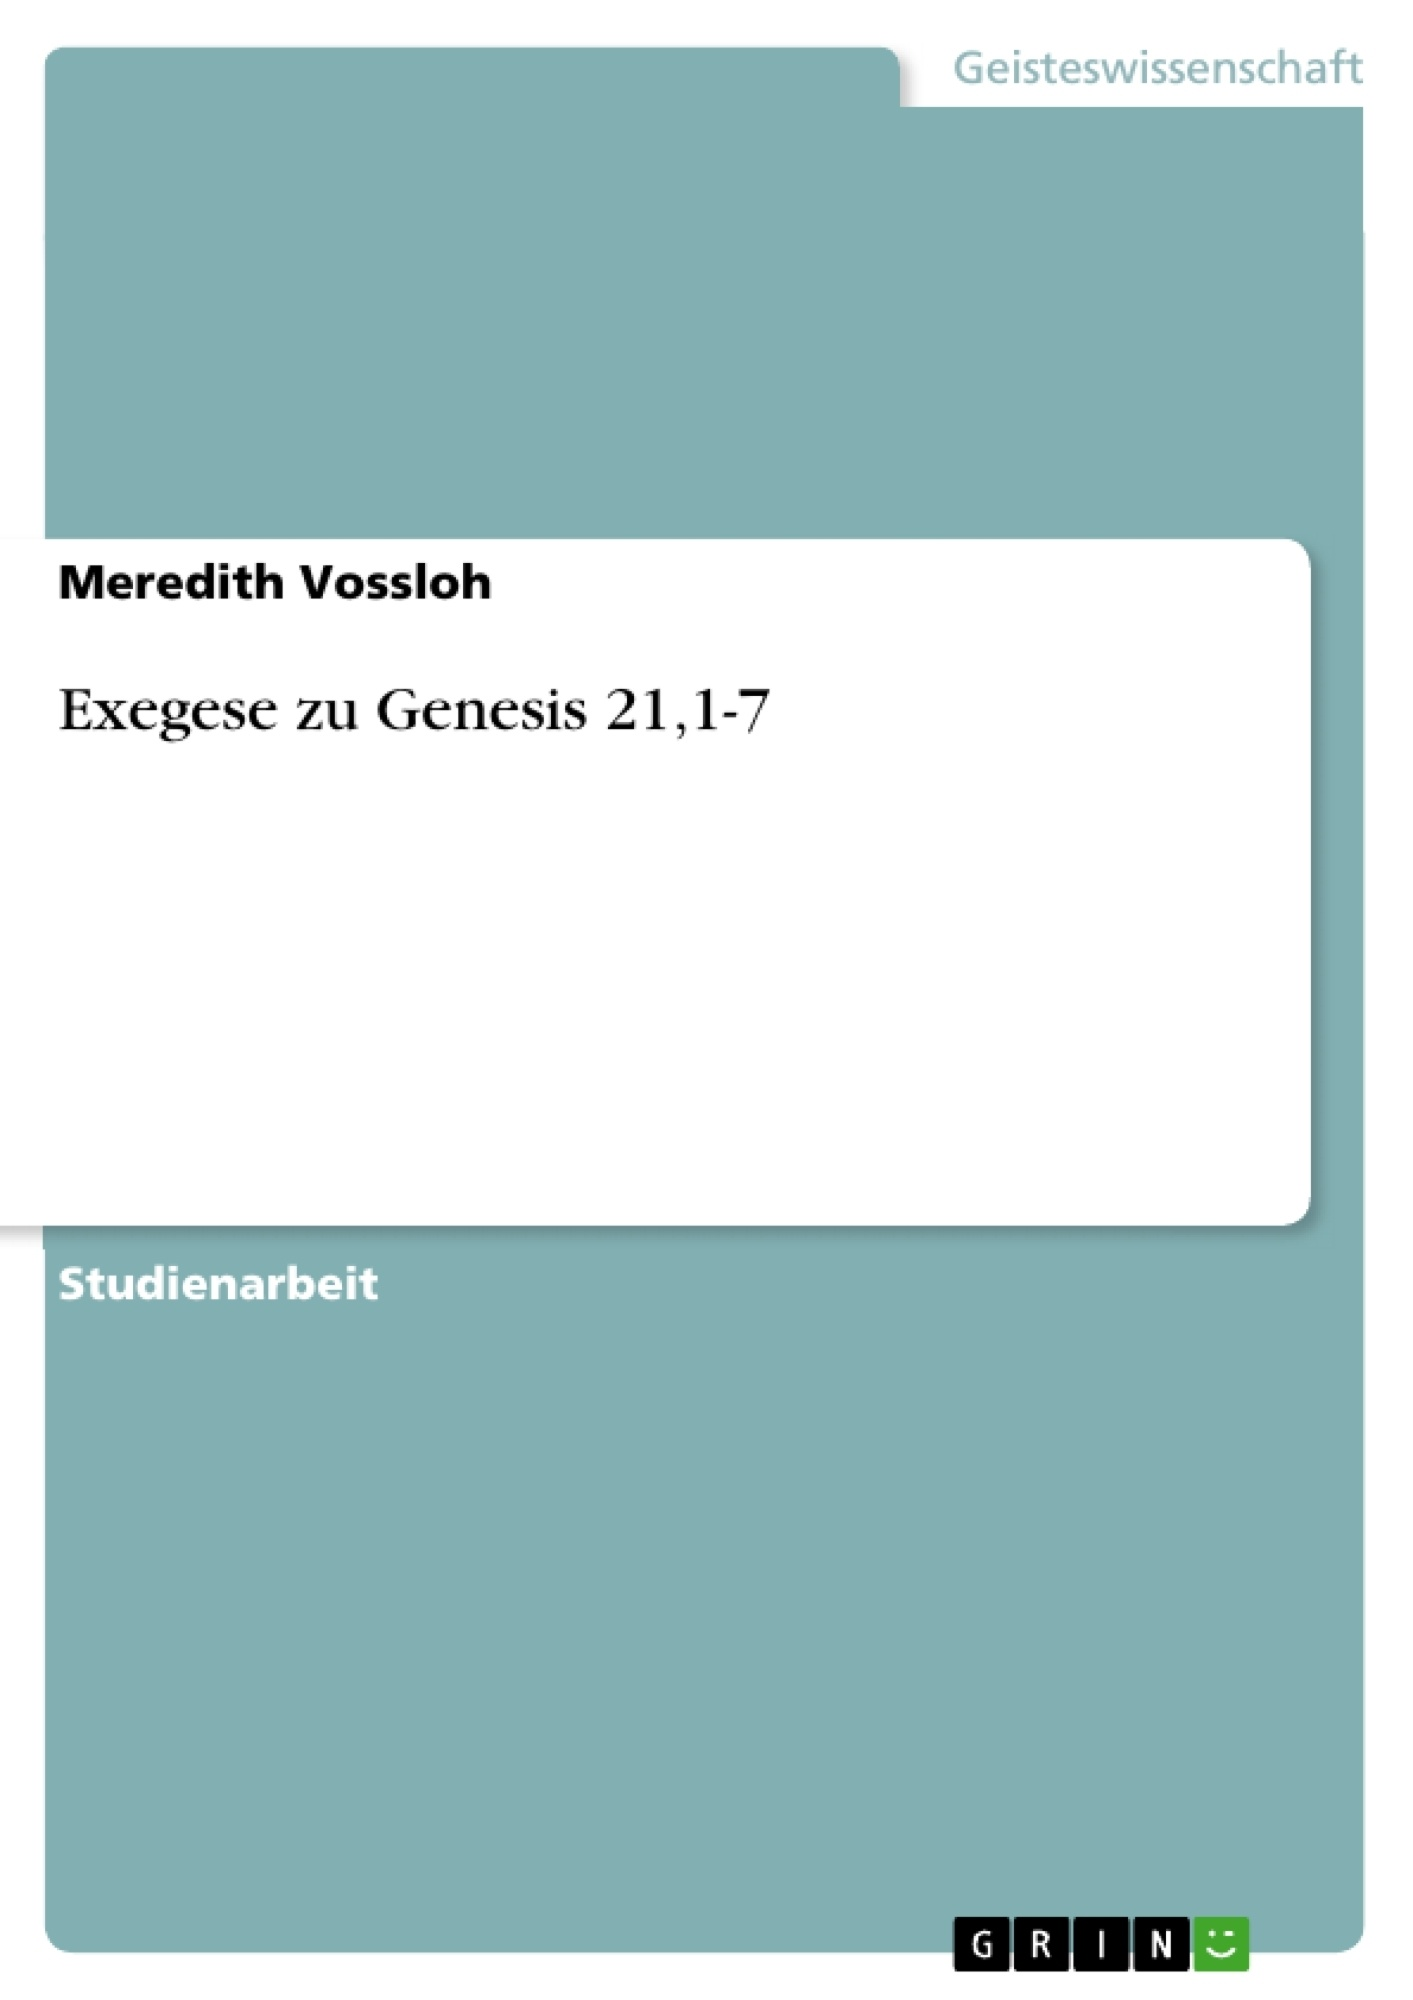 Titel: Exegese zu Genesis 21,1-7